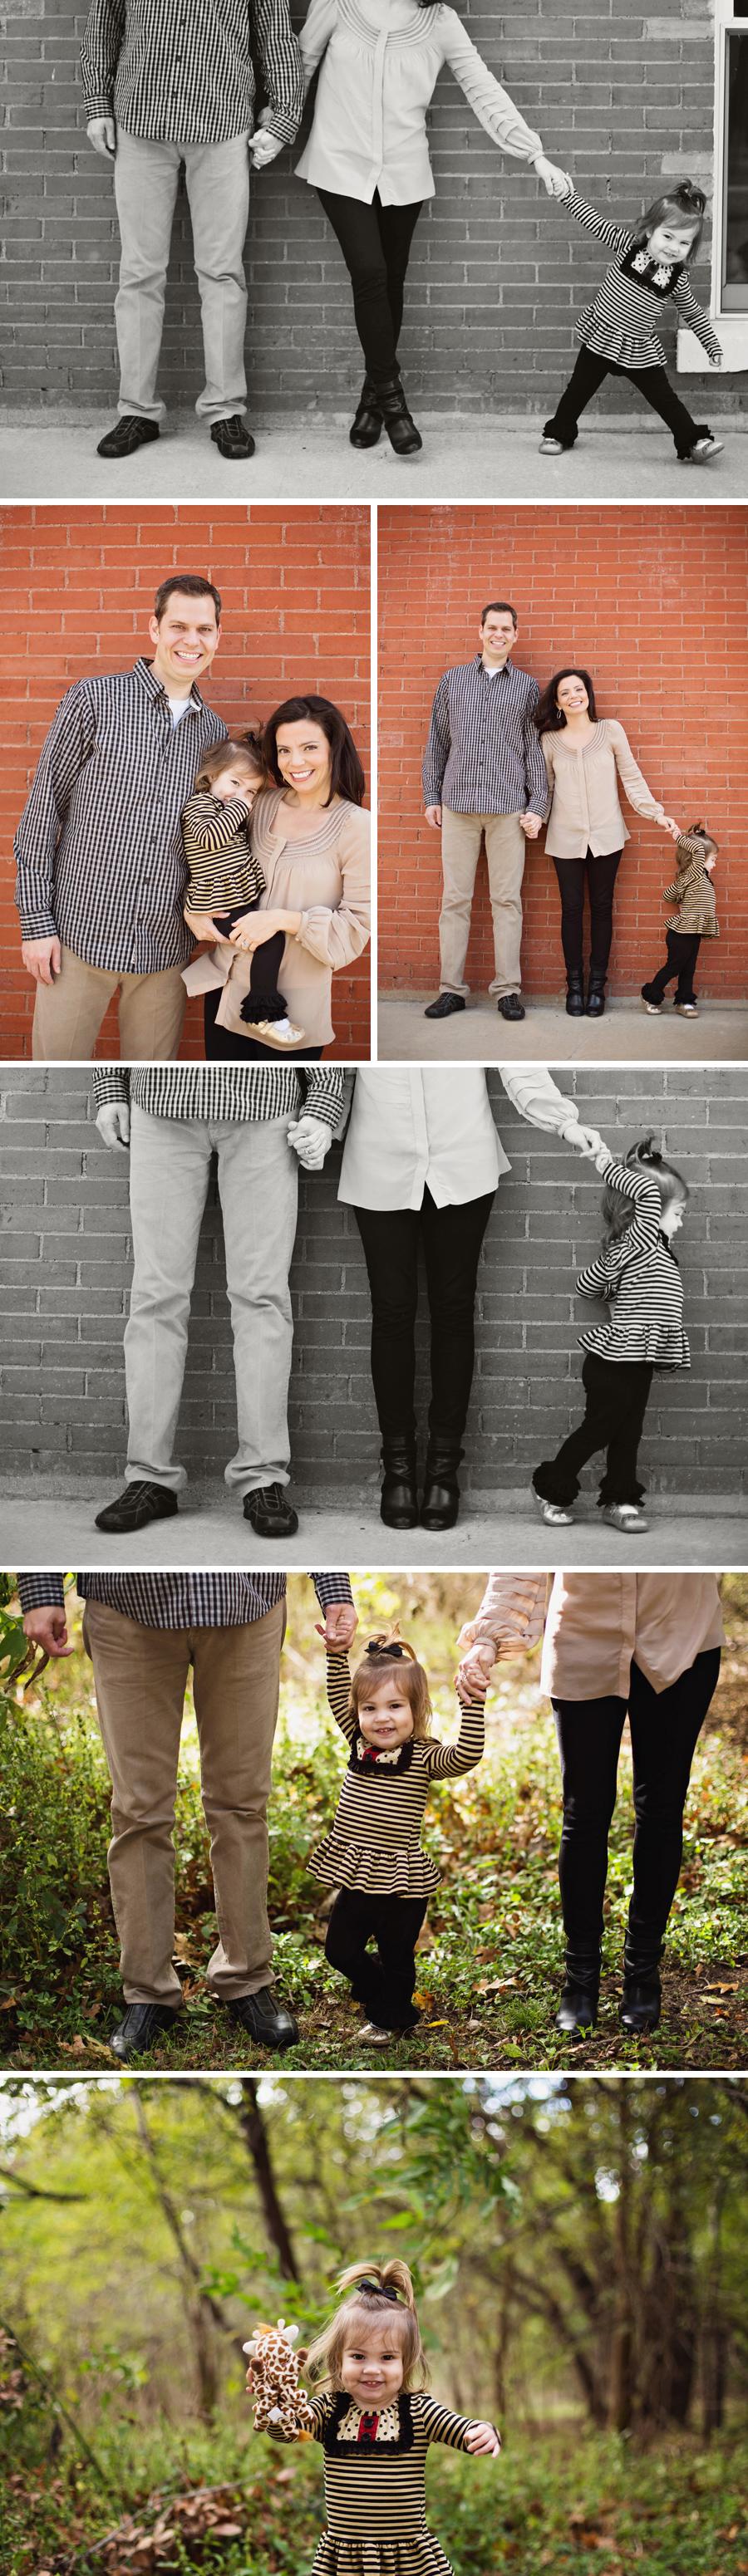 Dallas-Family-PhotographerG1